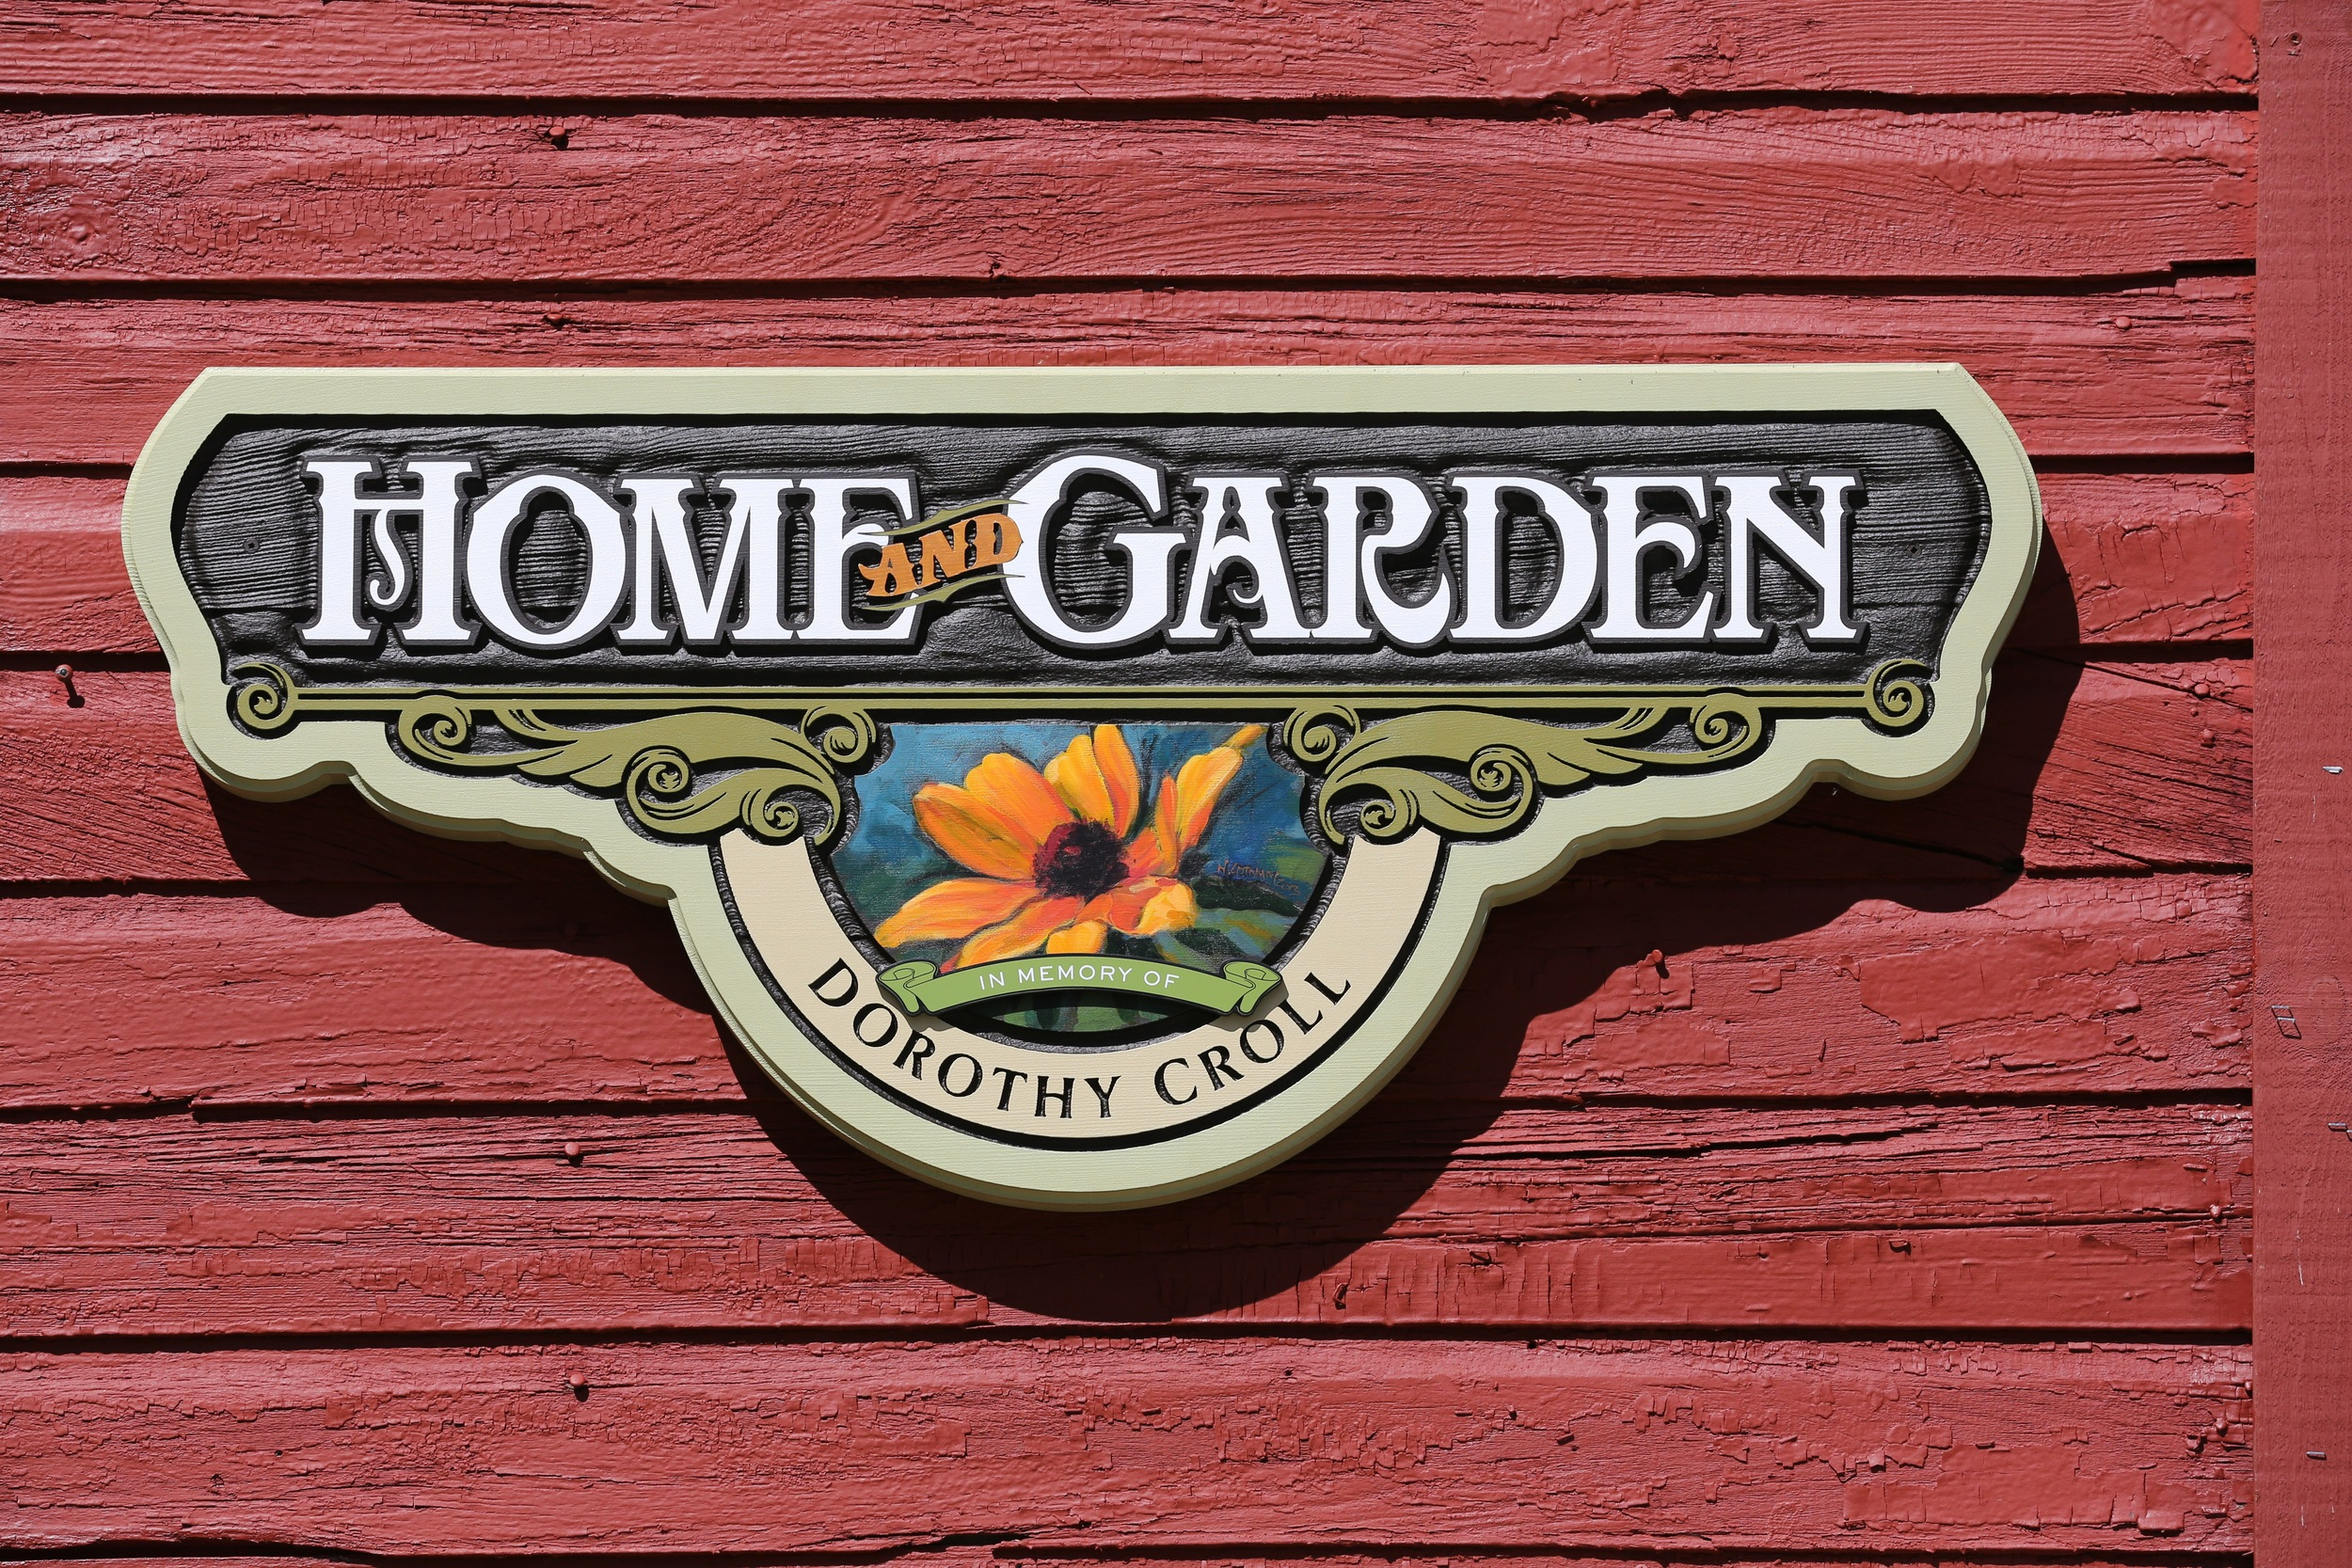 home garden1.jpg